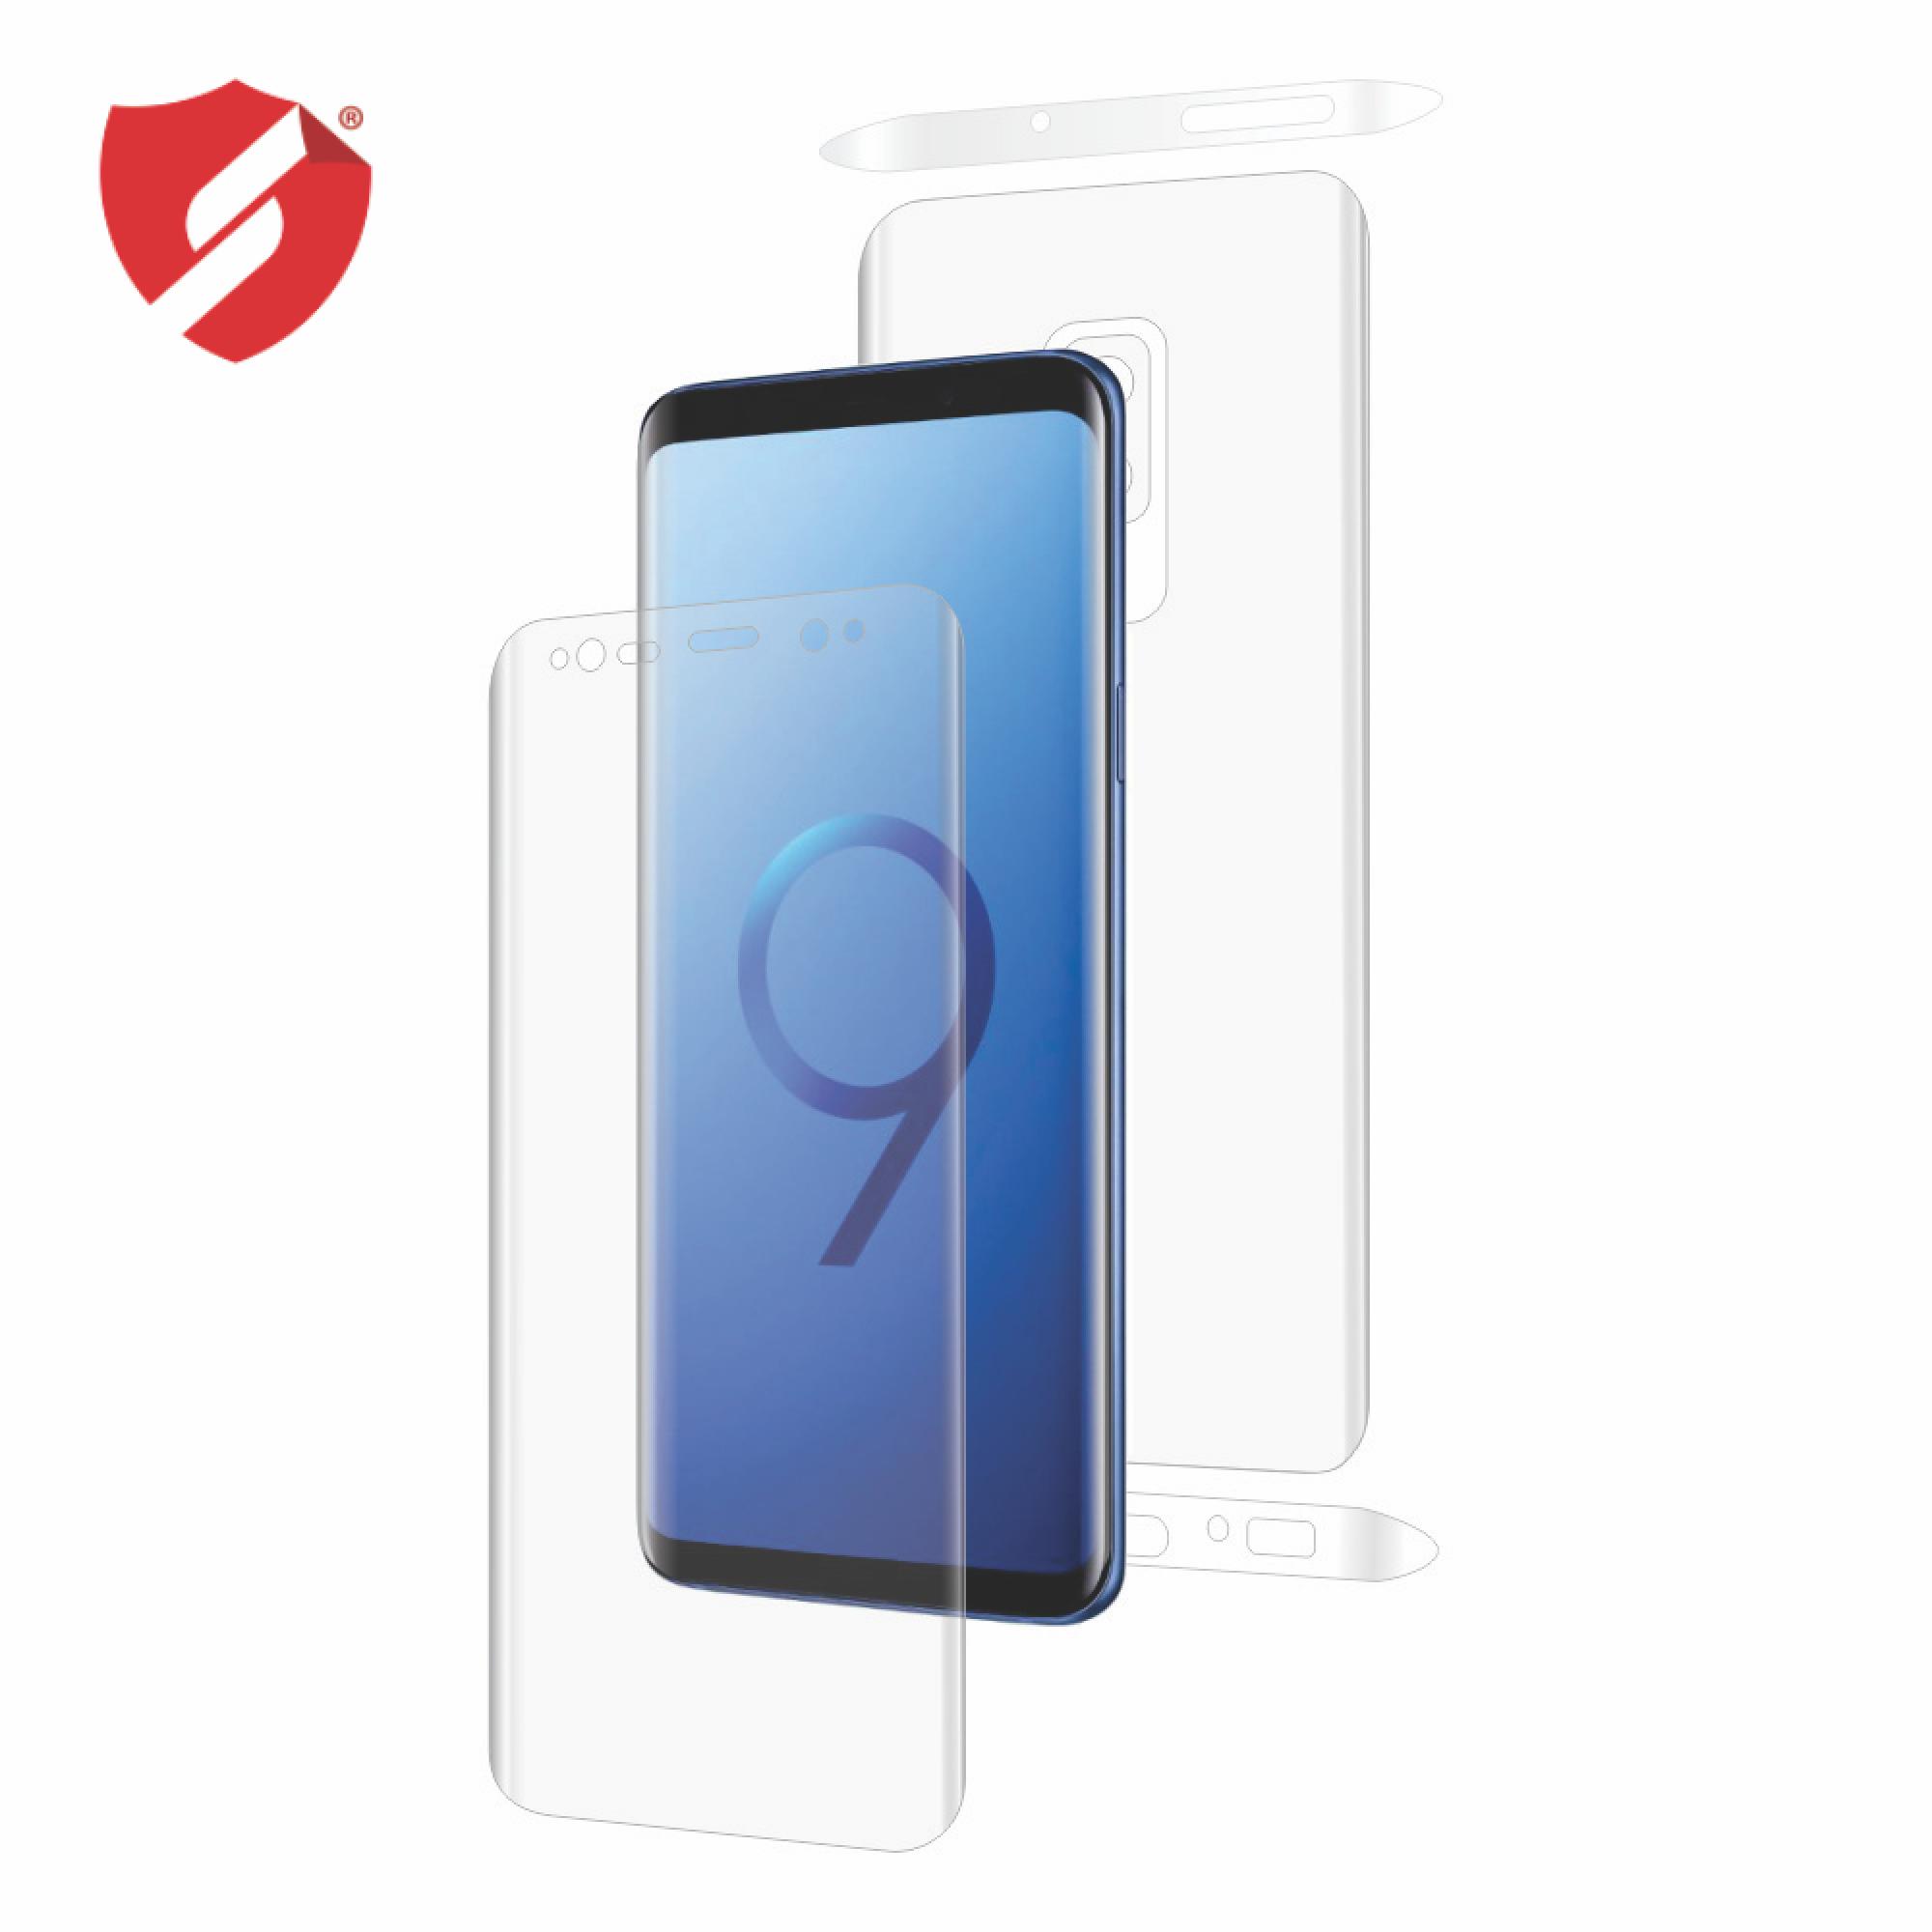 Folie de protectie Smart Protection Samsung Galaxy S9 Plus compatibila cu carcasa Clear Cover - fullbody - display + spate + laterale imagine